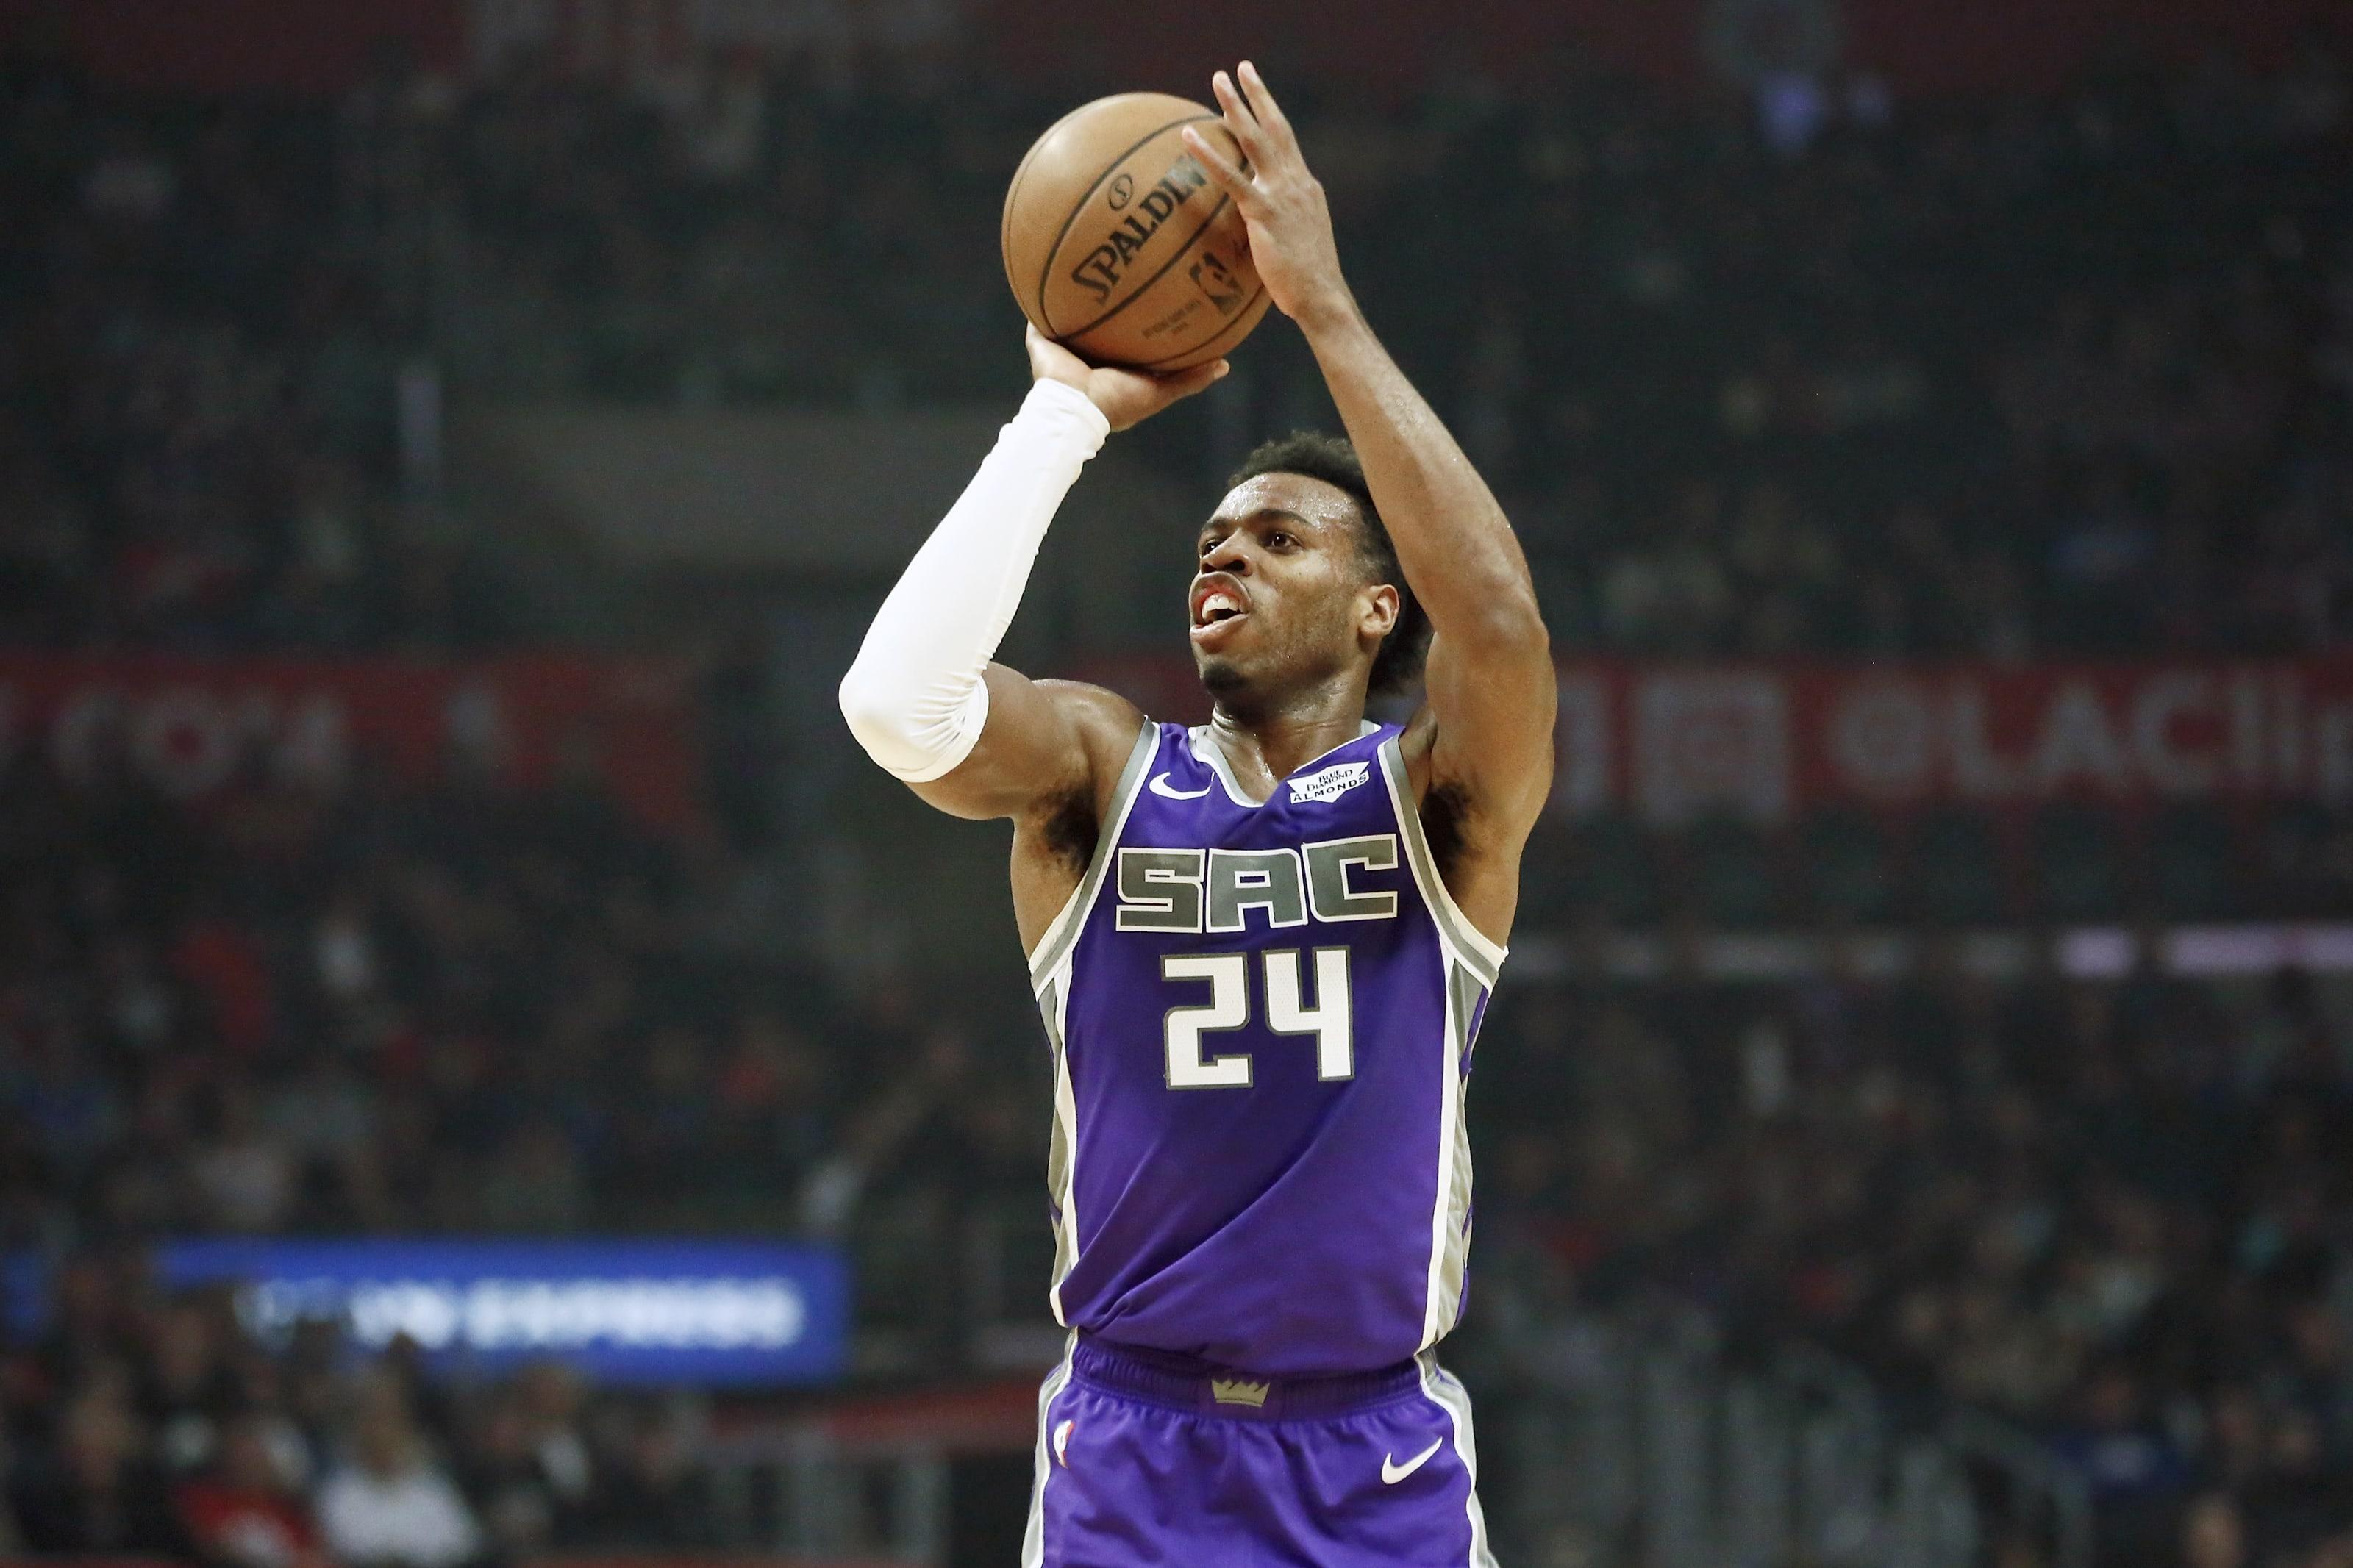 Sacramento Kings: Where does Buddy Hield rank among the league's top shooters?